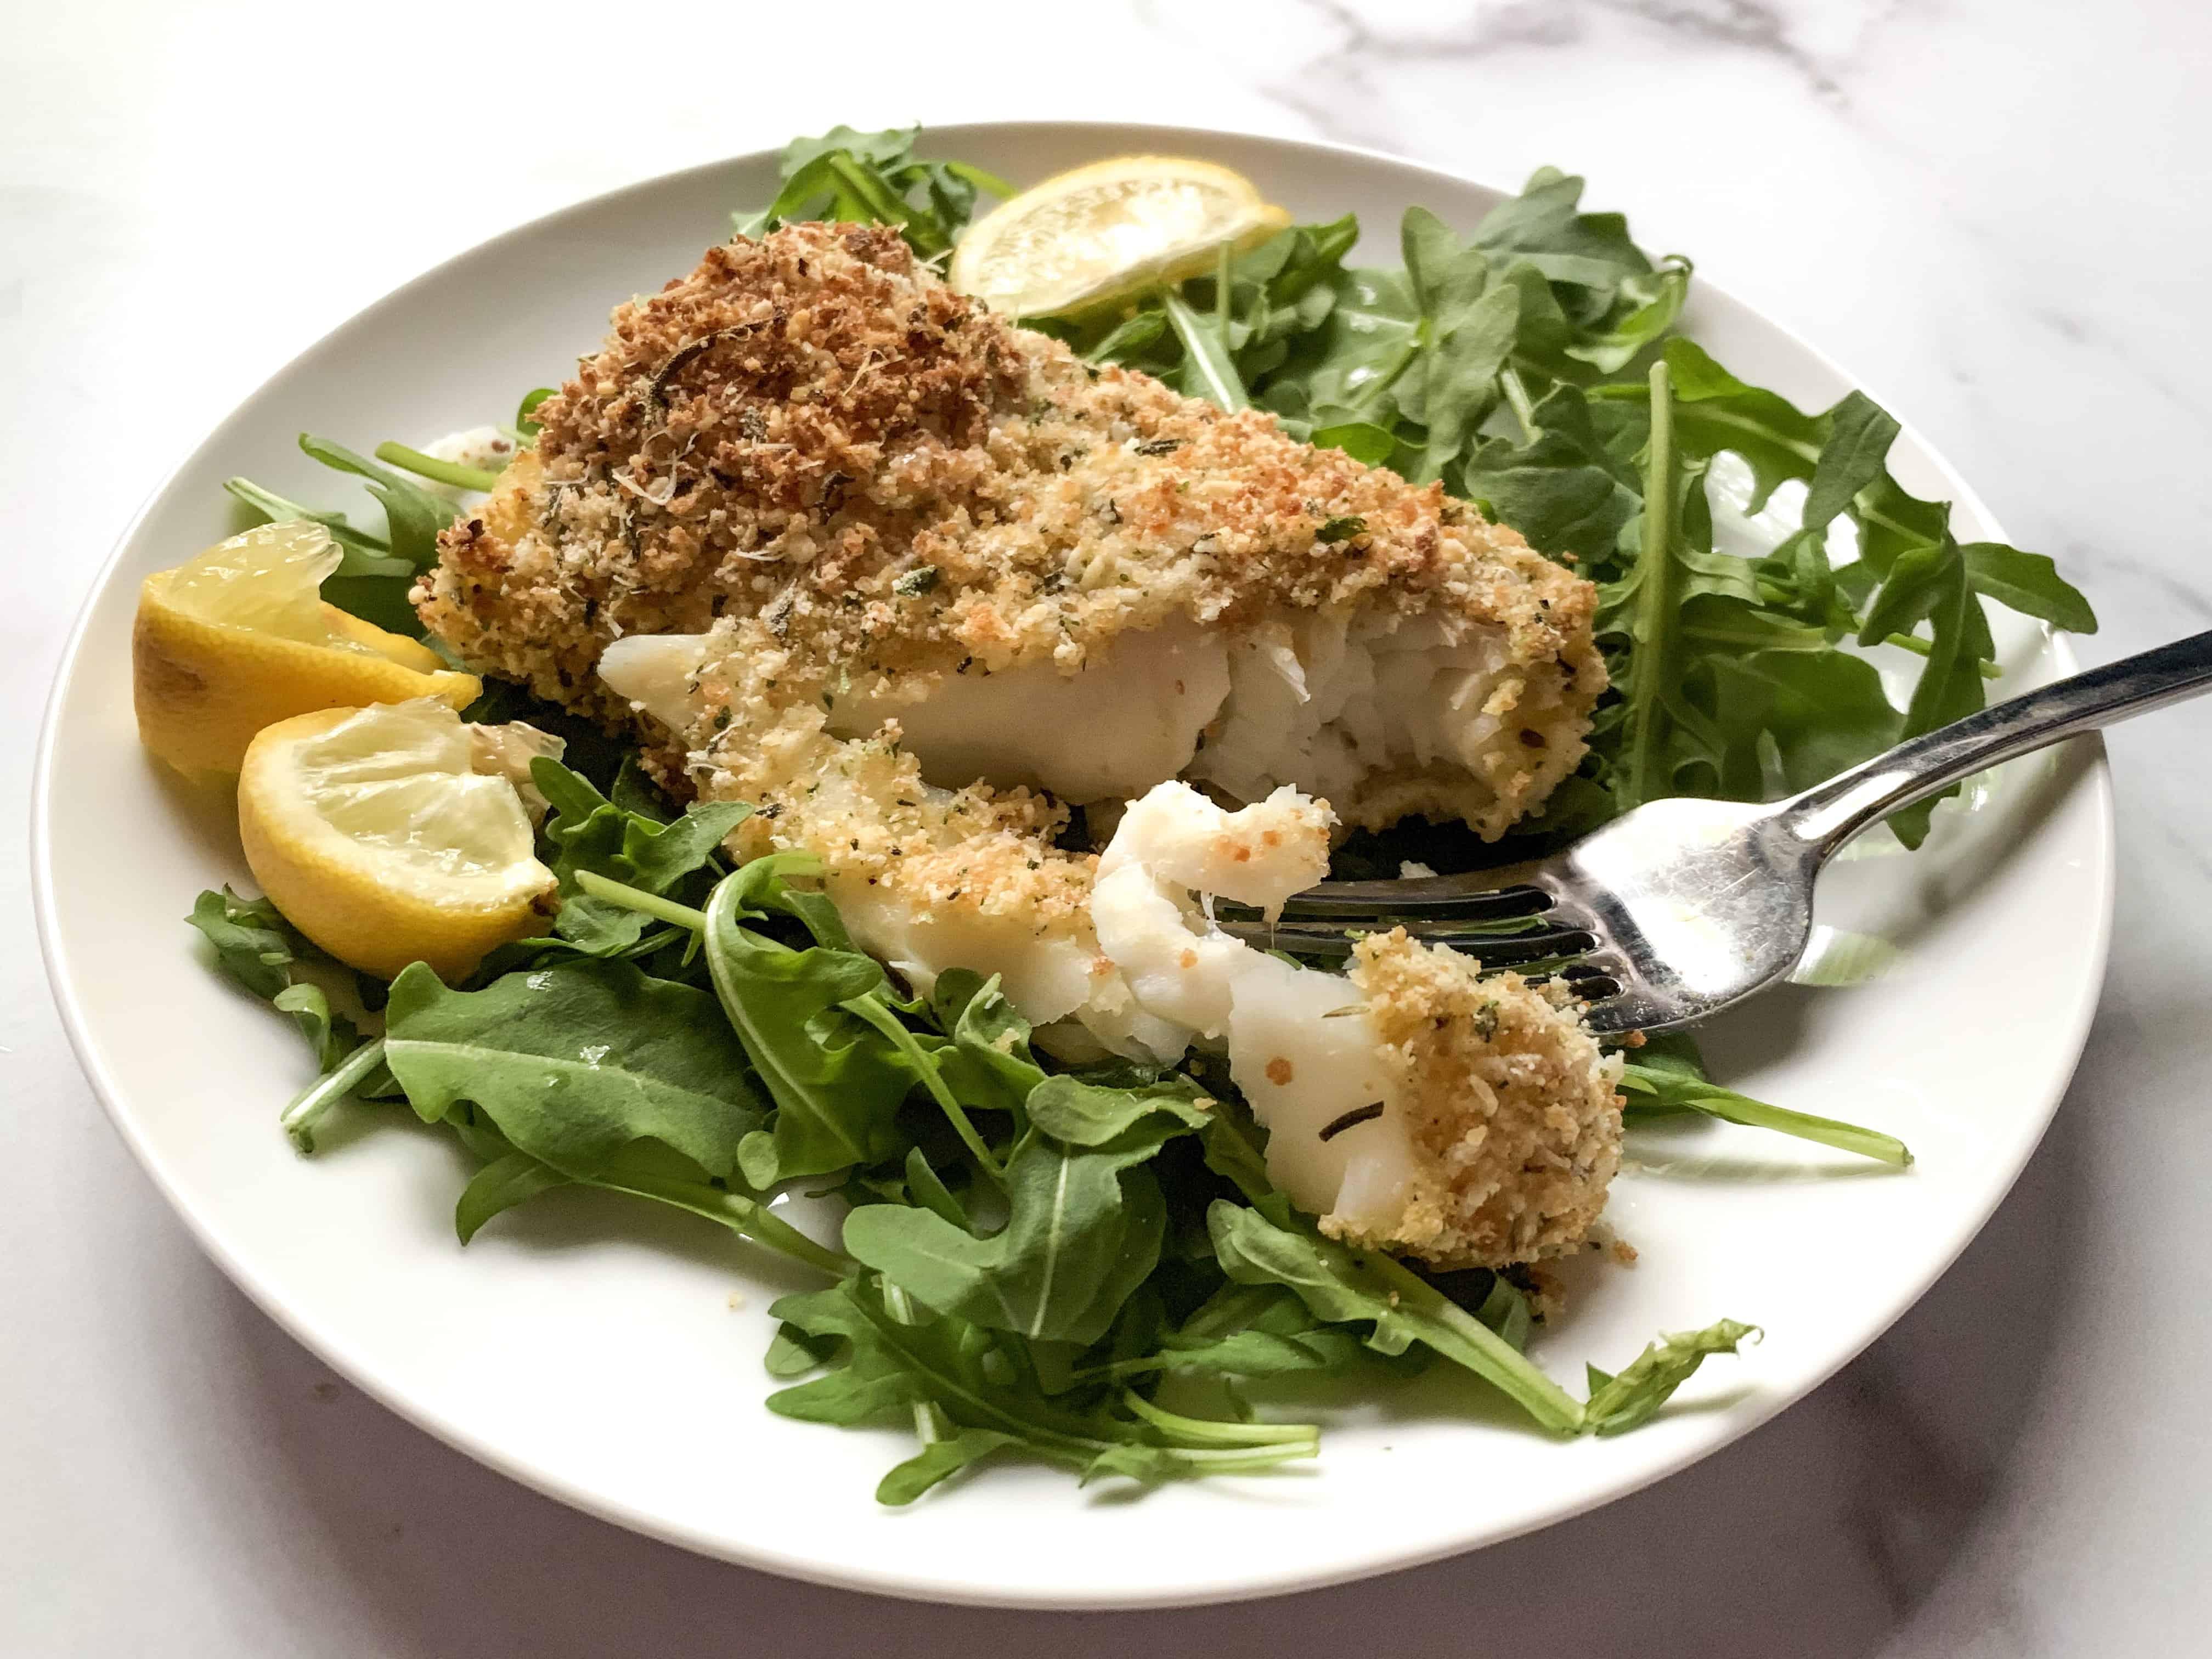 panko and rosemary cod filet opened